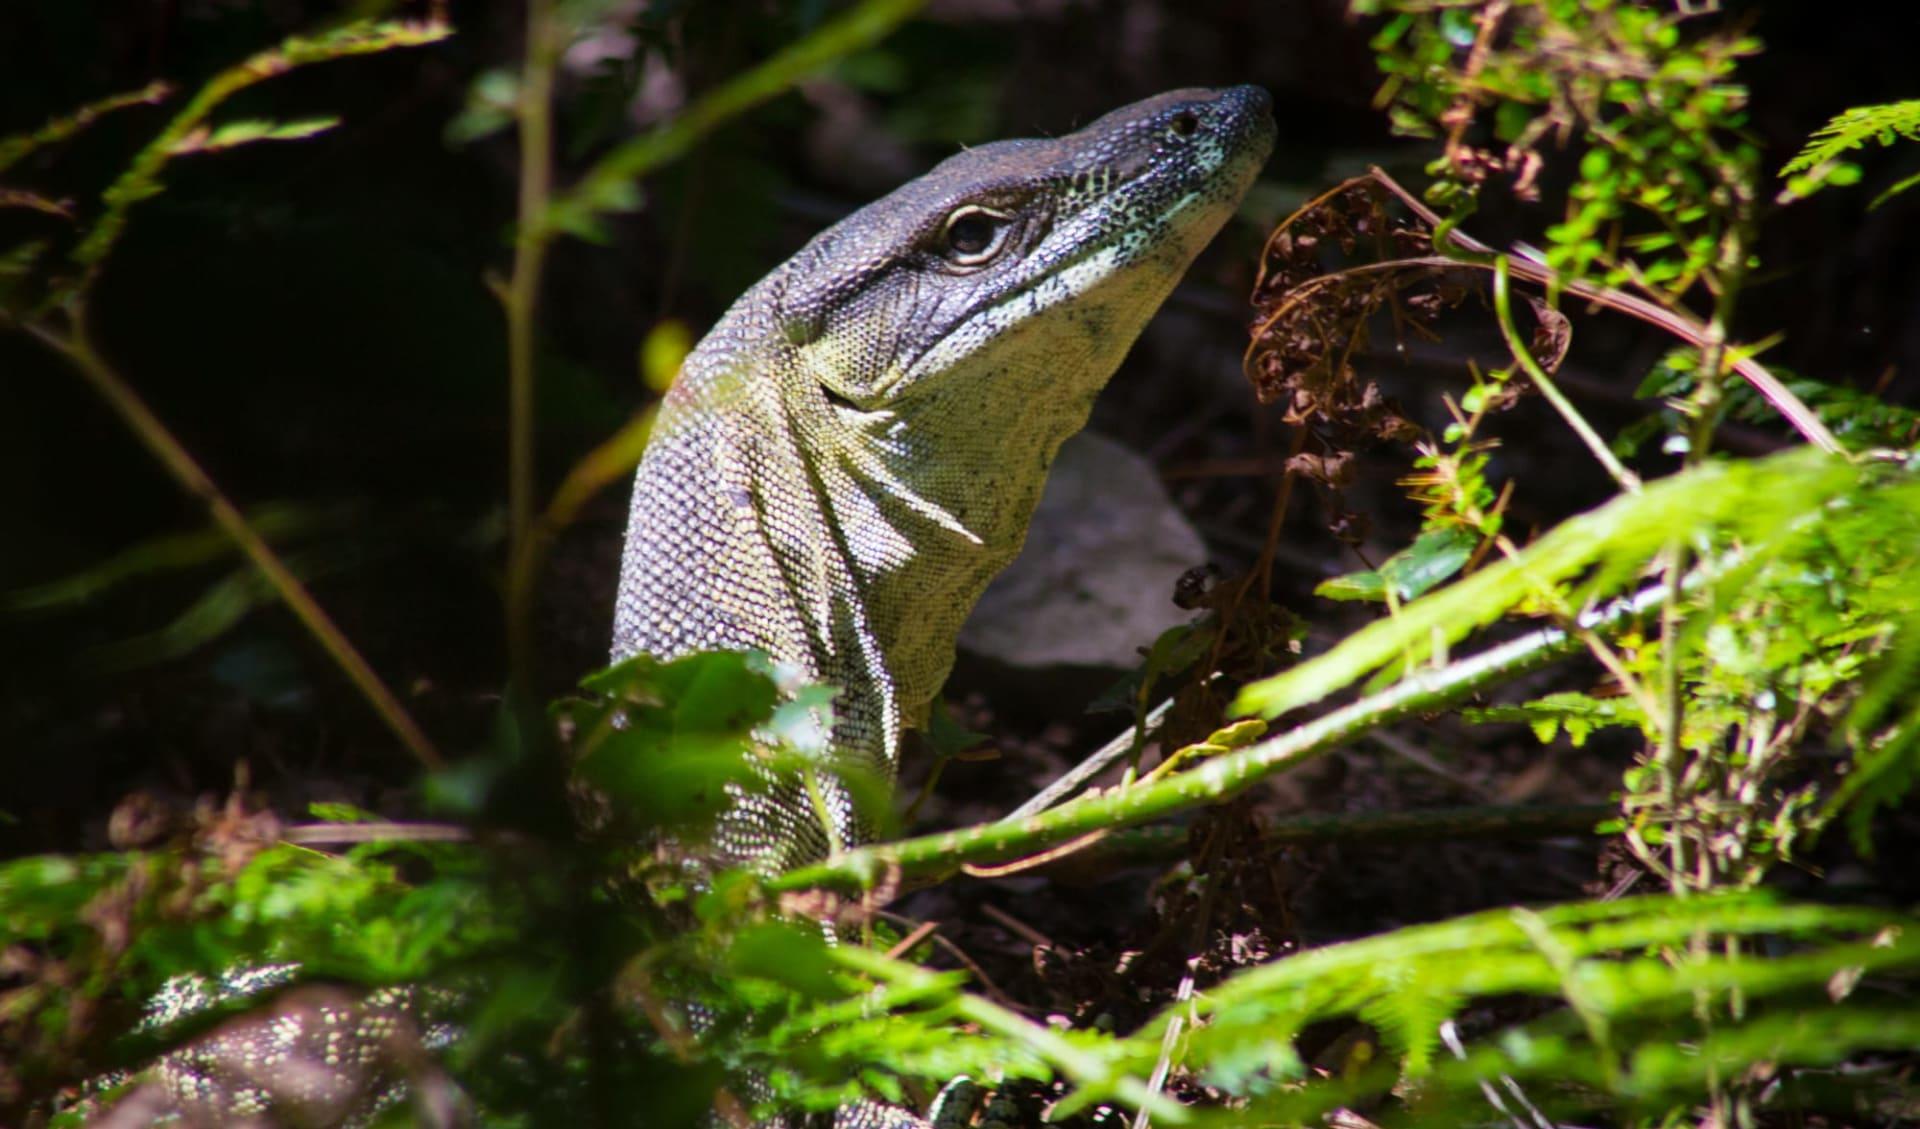 Cape York Safari ab Cairns: Australia - Queensland - Scenic Rim Trail - Waran